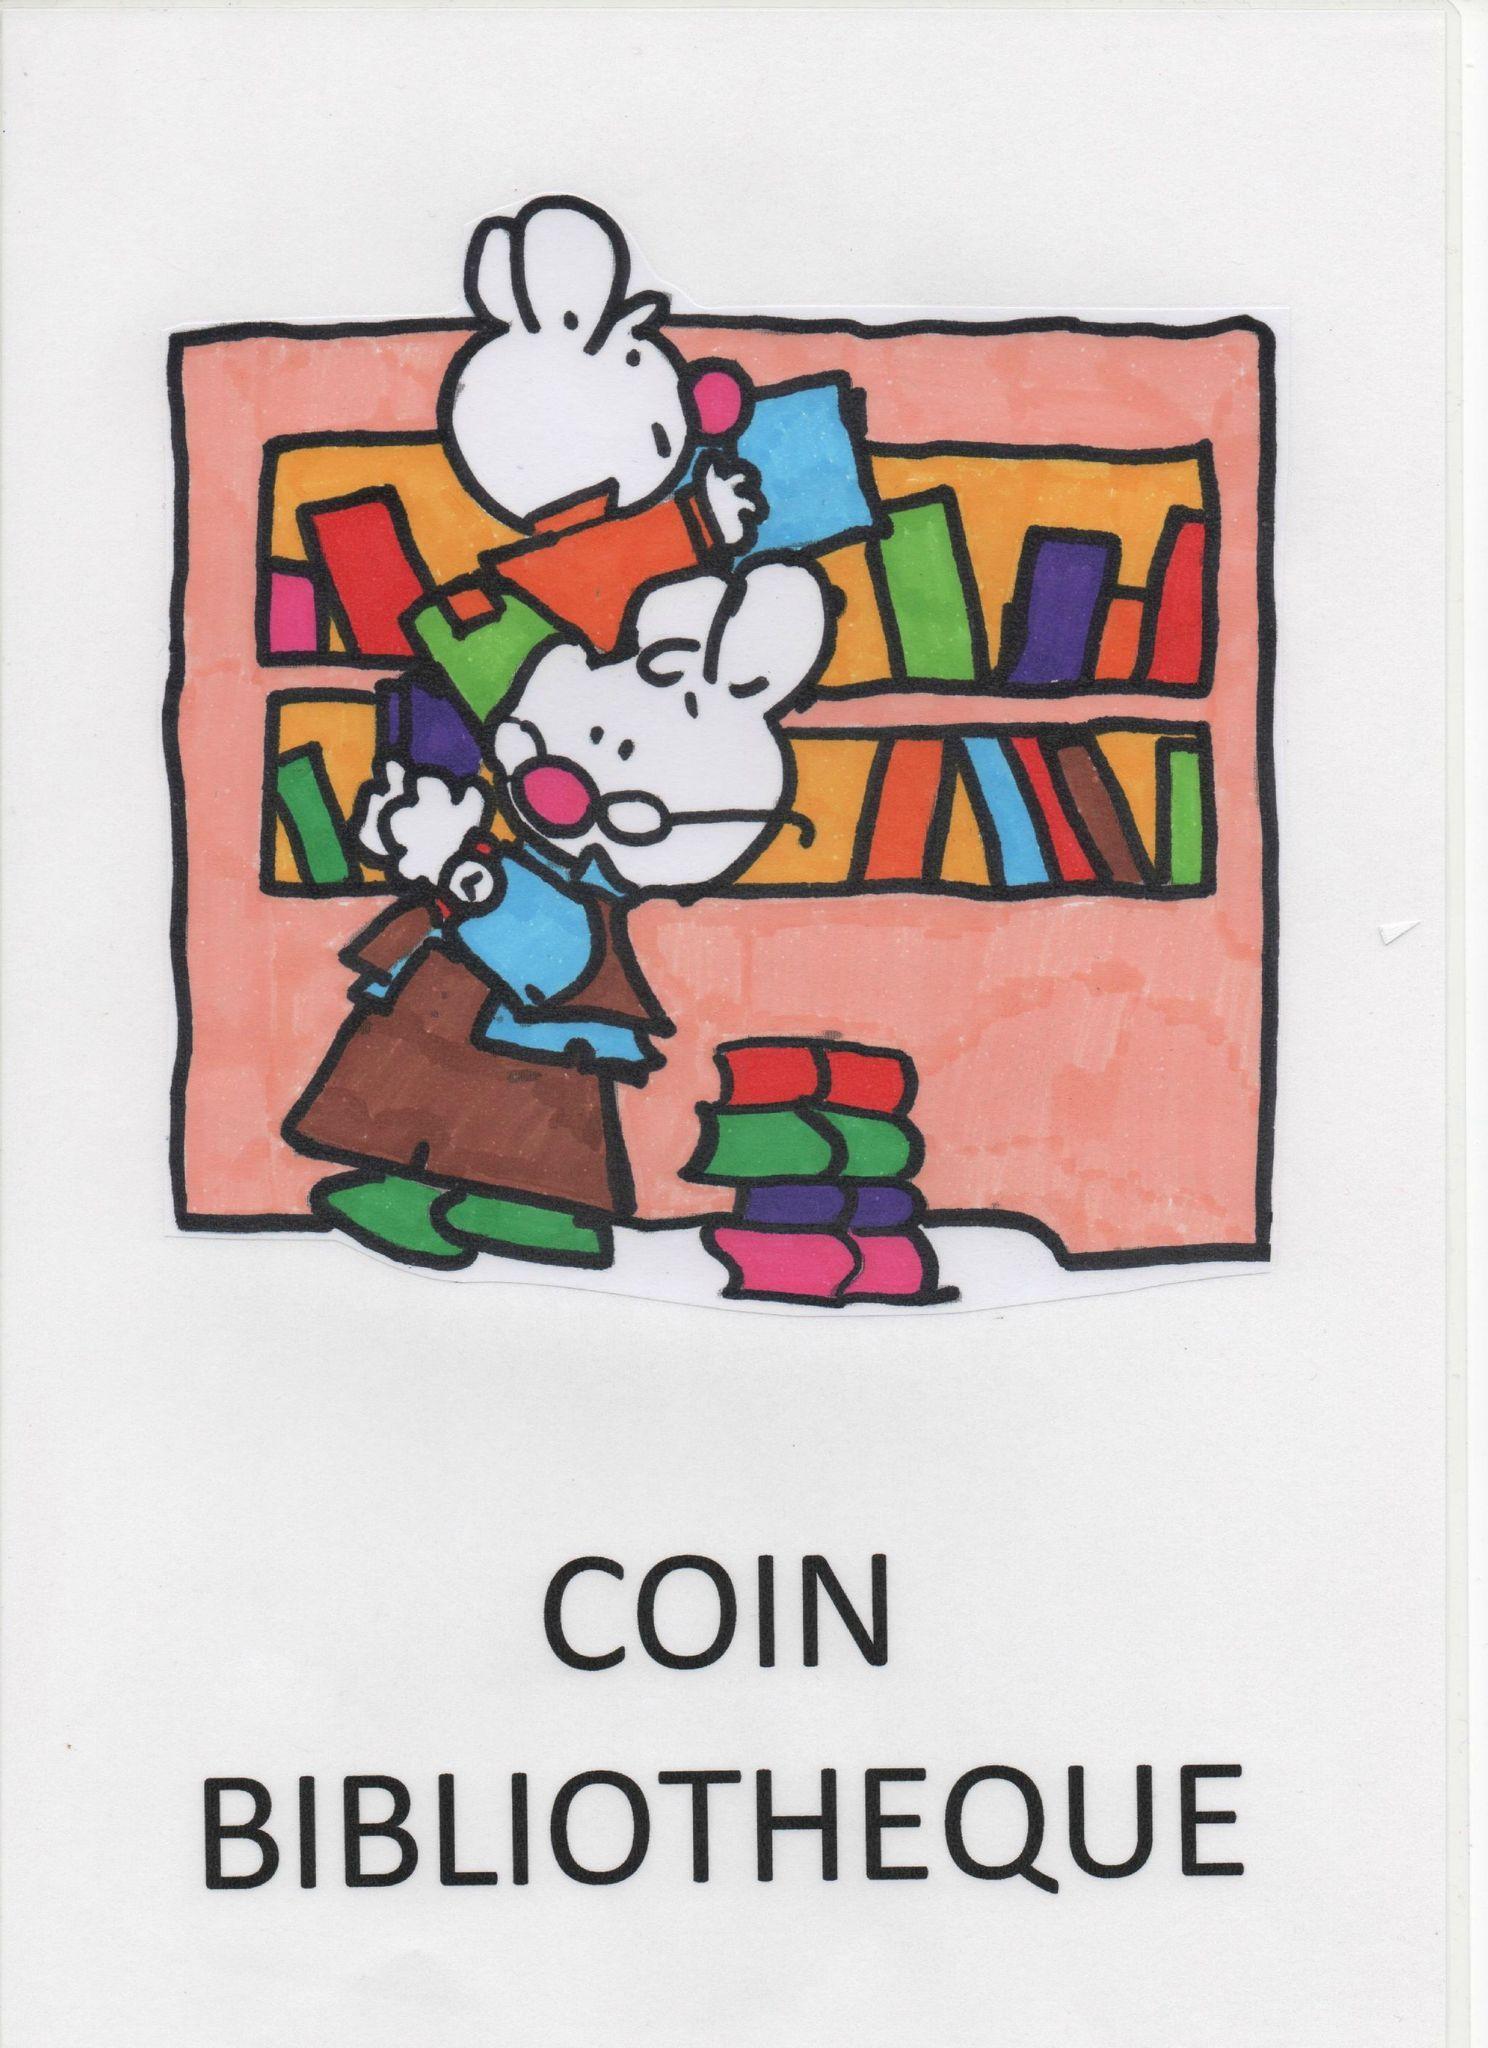 Coin Bibliotheque Affiche